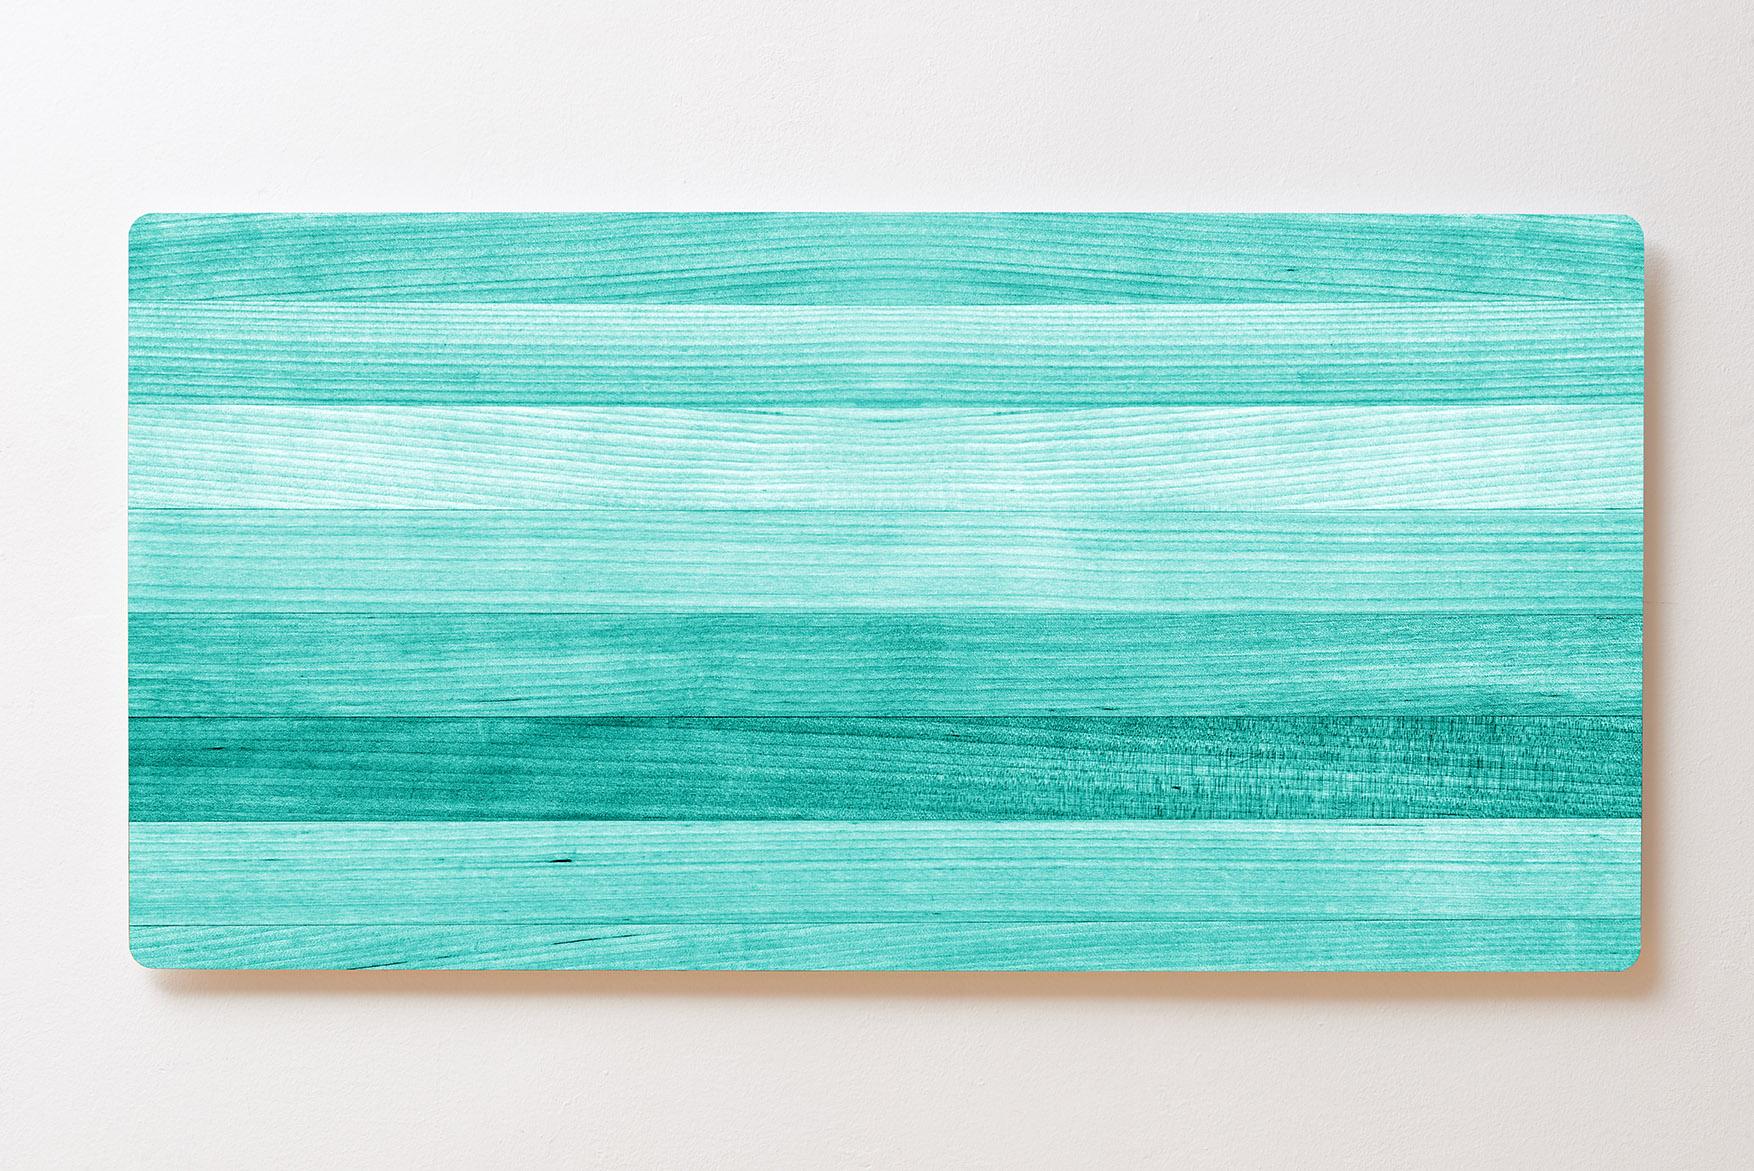 Magnettafel BACKLIGHT 120x60cm Motiv-Wandbild M124 Holzplatten Türkis